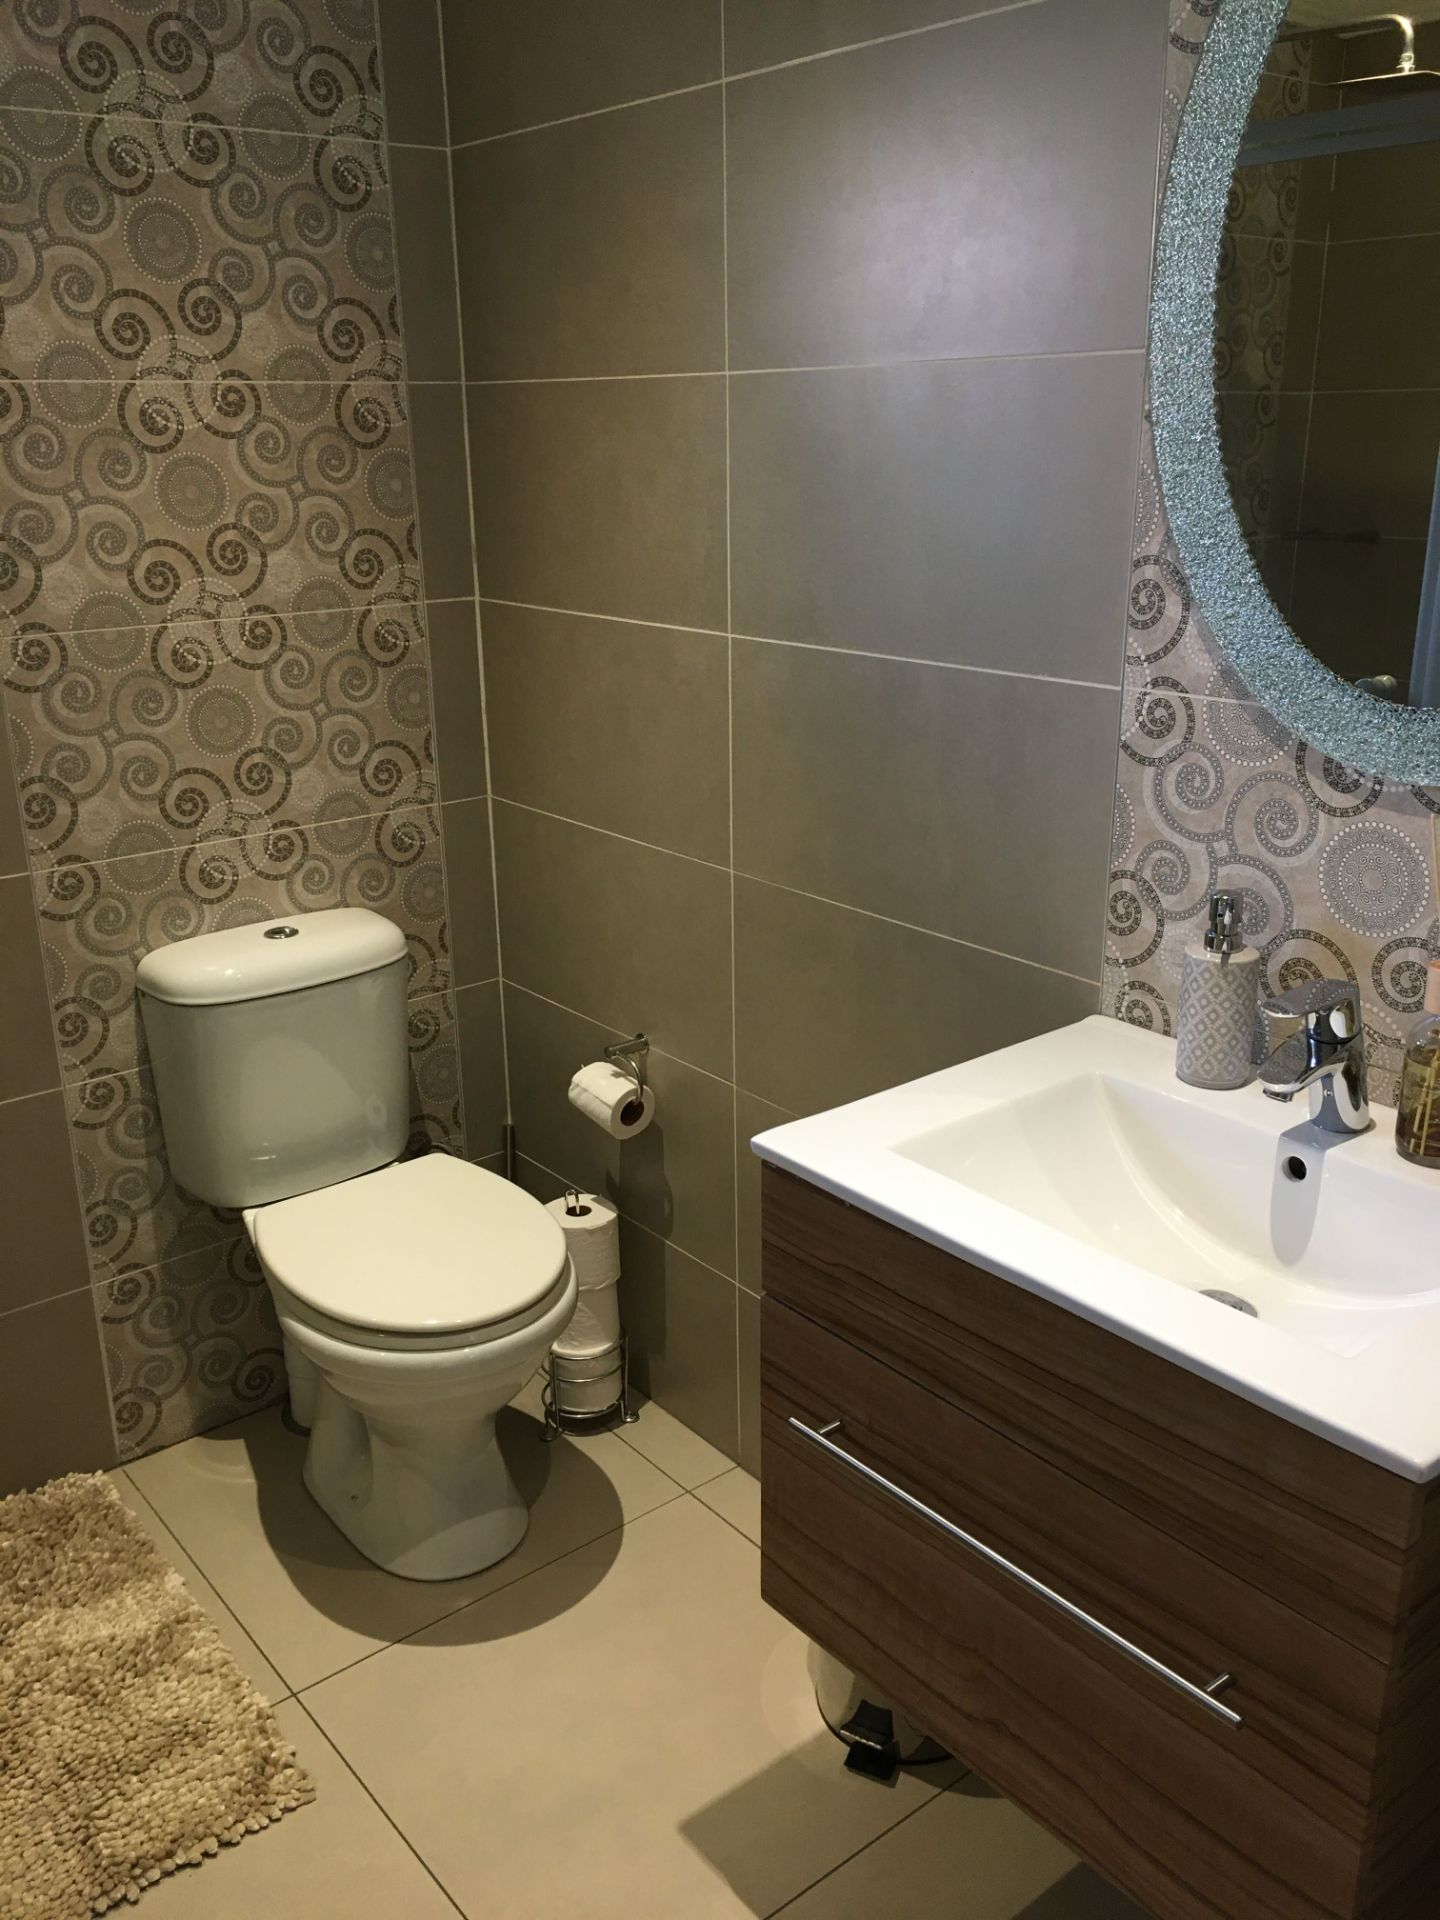 21_VT 23 Bathroom_1.JPG